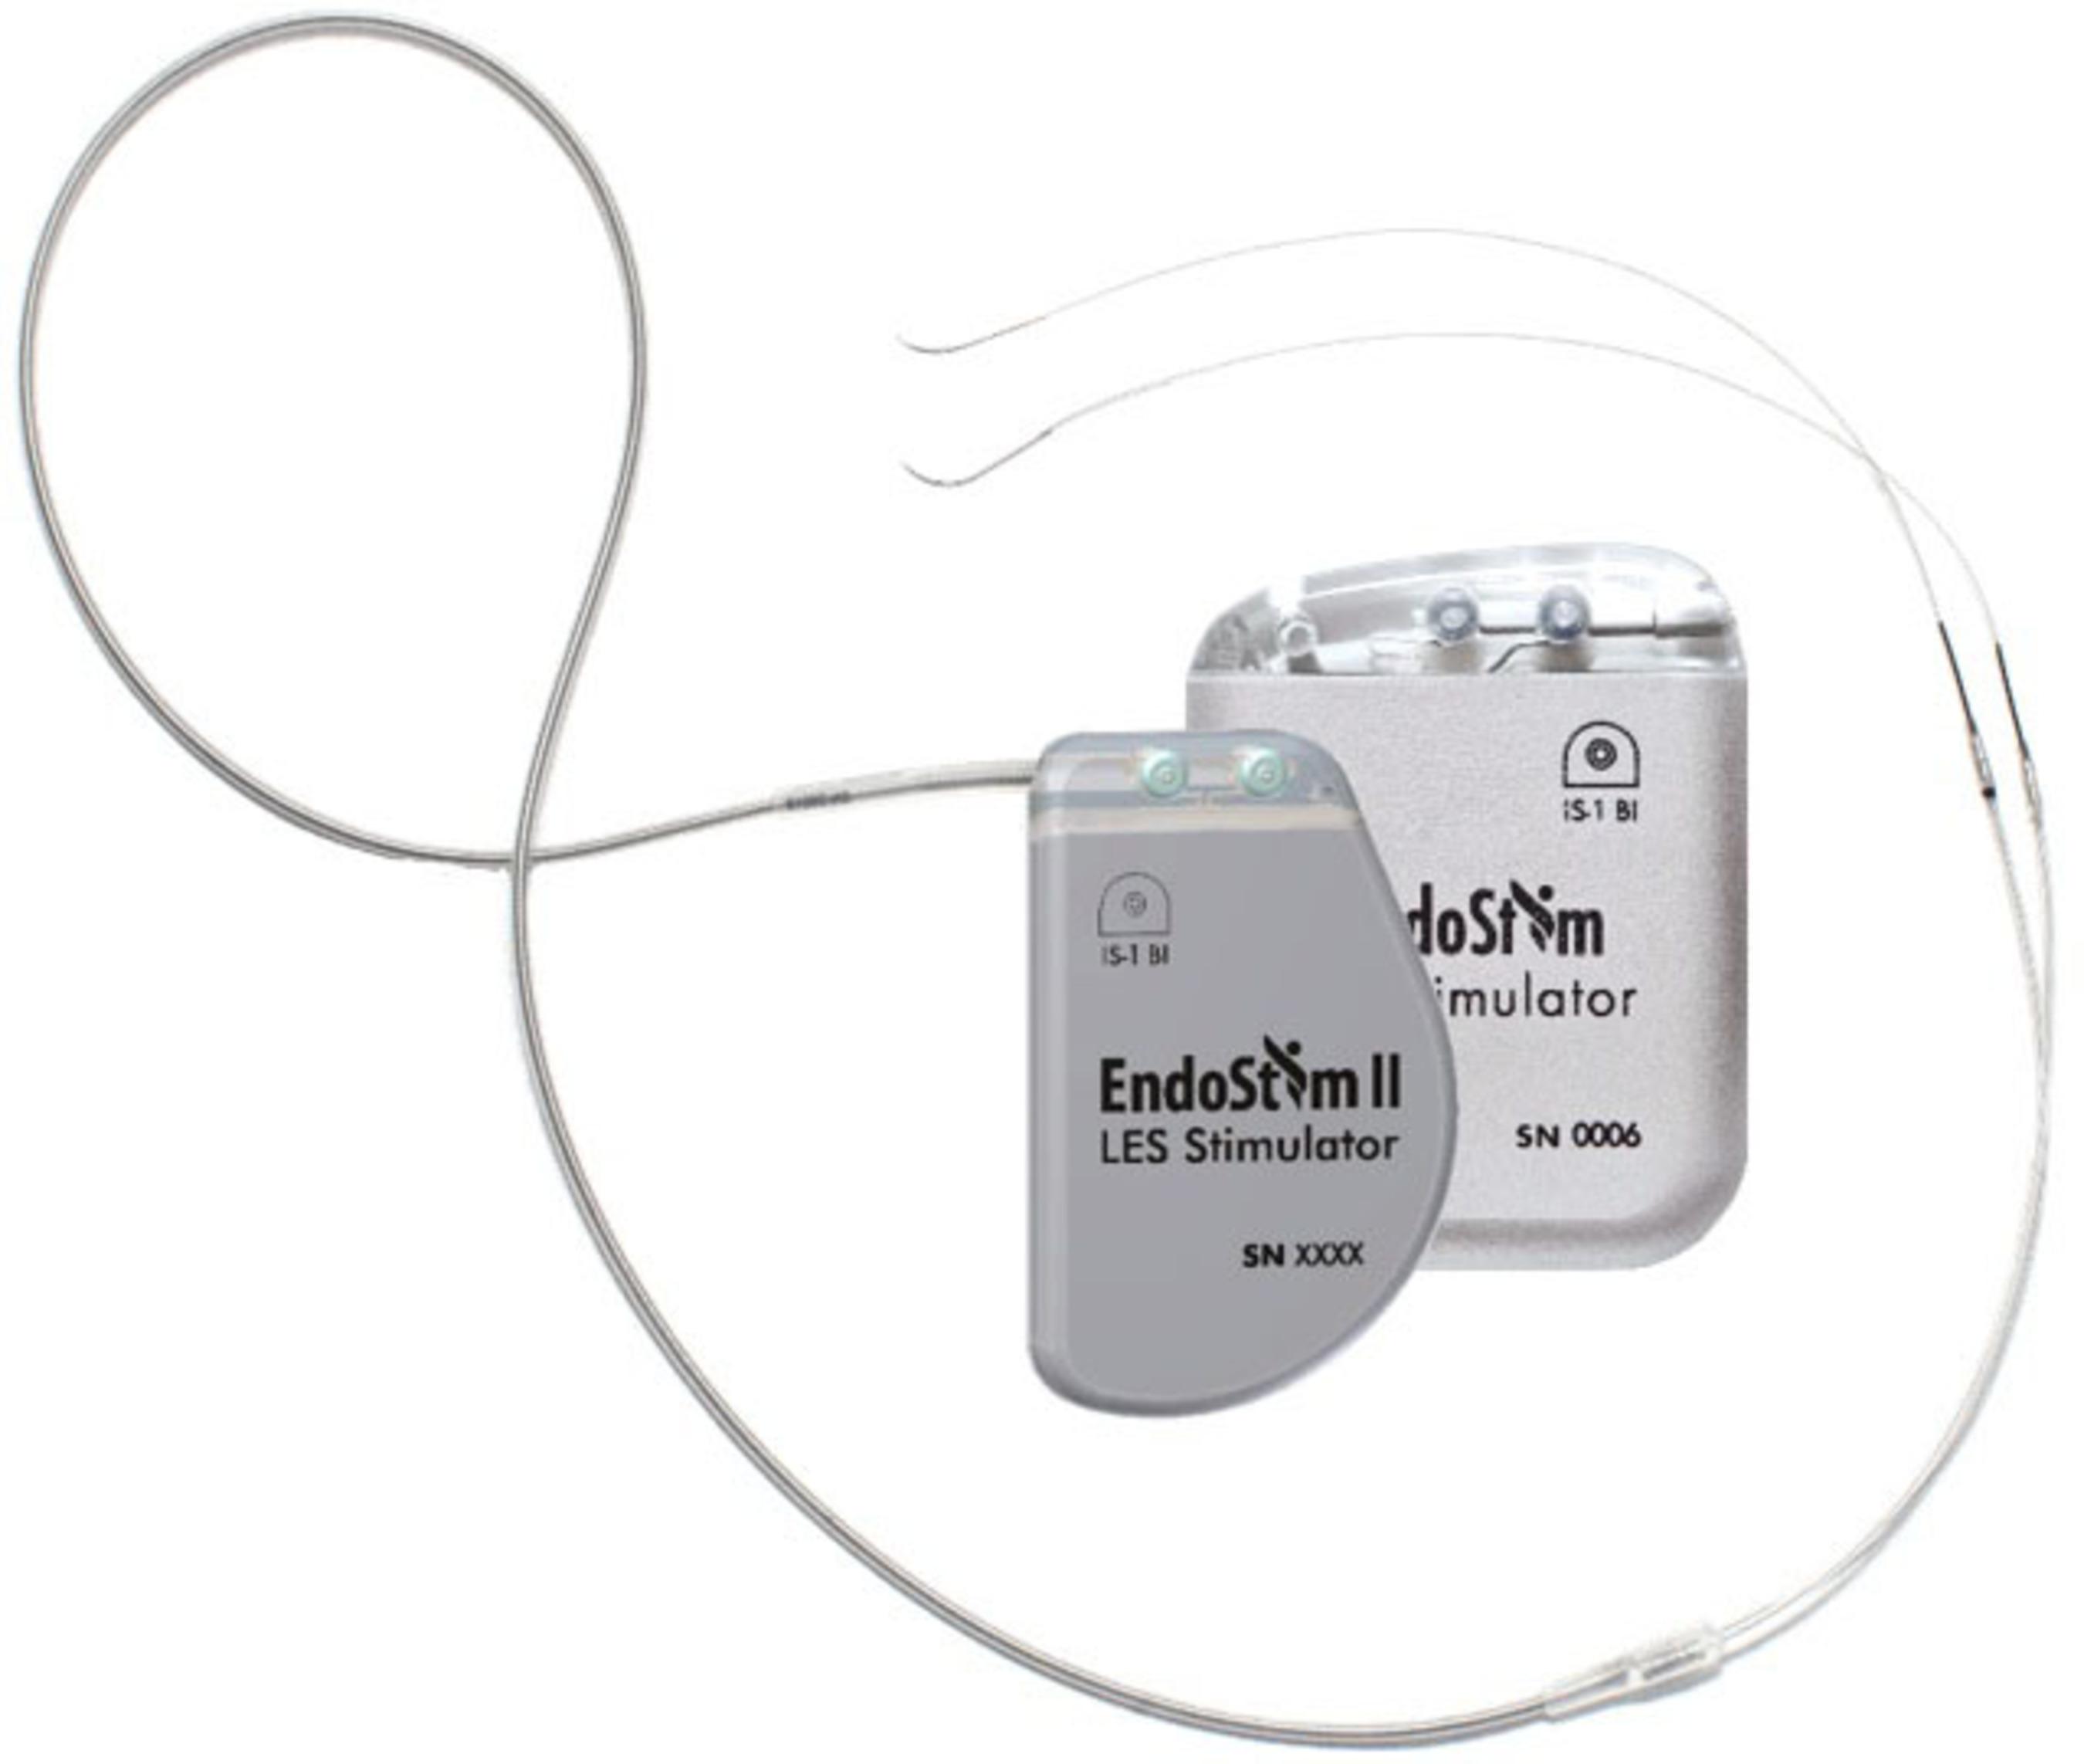 EndoStim Launches Second Generation Neurostimulation Device for GERD